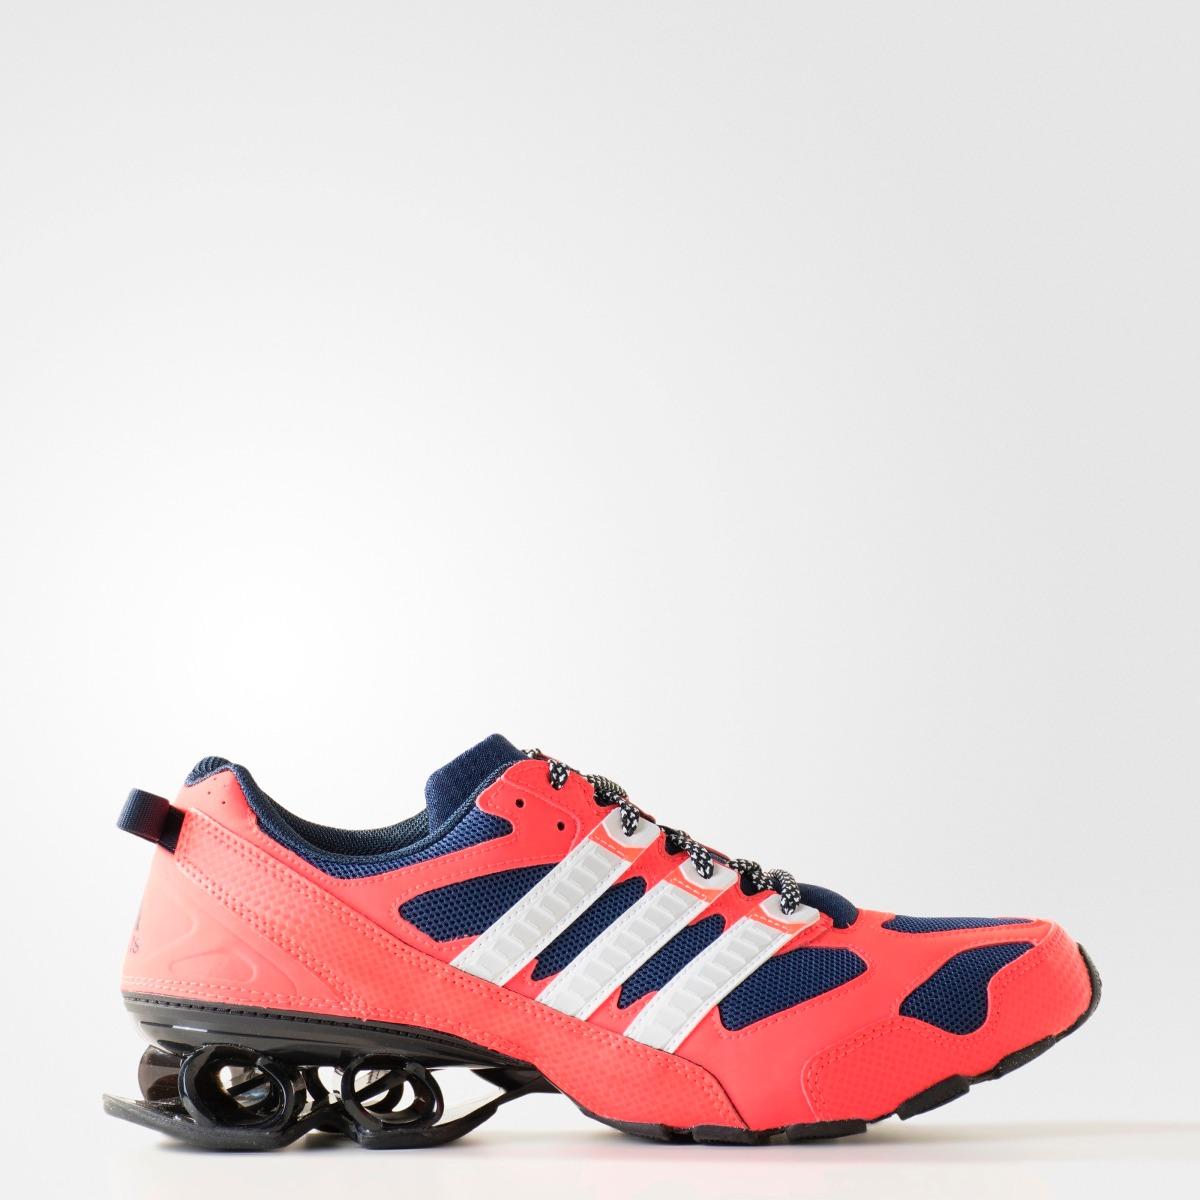 cdc4da56c4b tênis adidas new cosmos masculino top e barato. Carregando zoom.